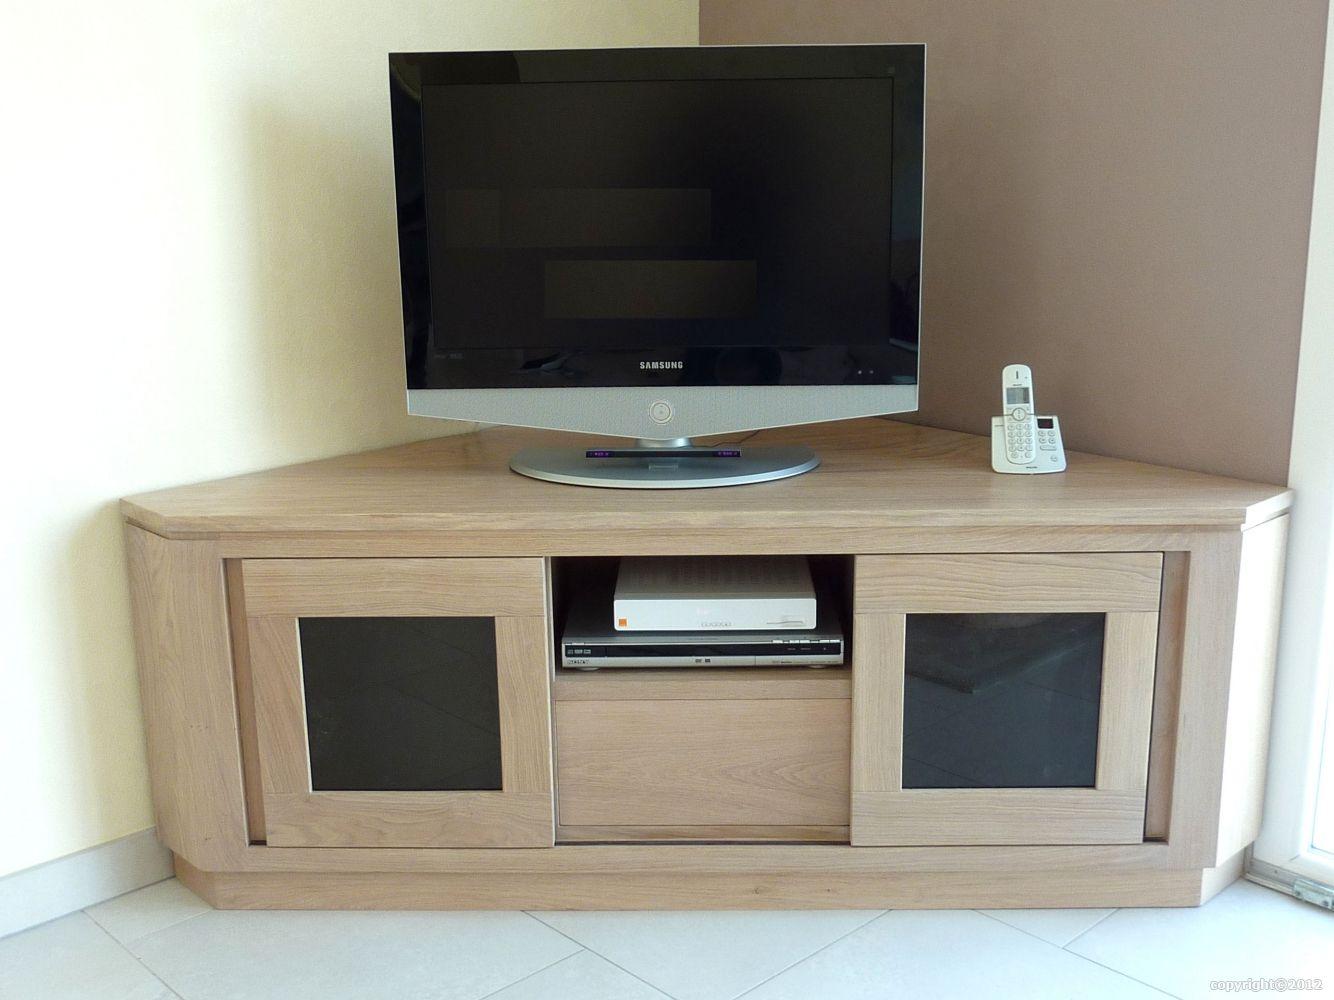 Meuble D Angle Moderne Pour Tv Petit Meuble D Angle Salon Petit Meuble D Angle Meuble Tv En Coin Meuble Tv Angle